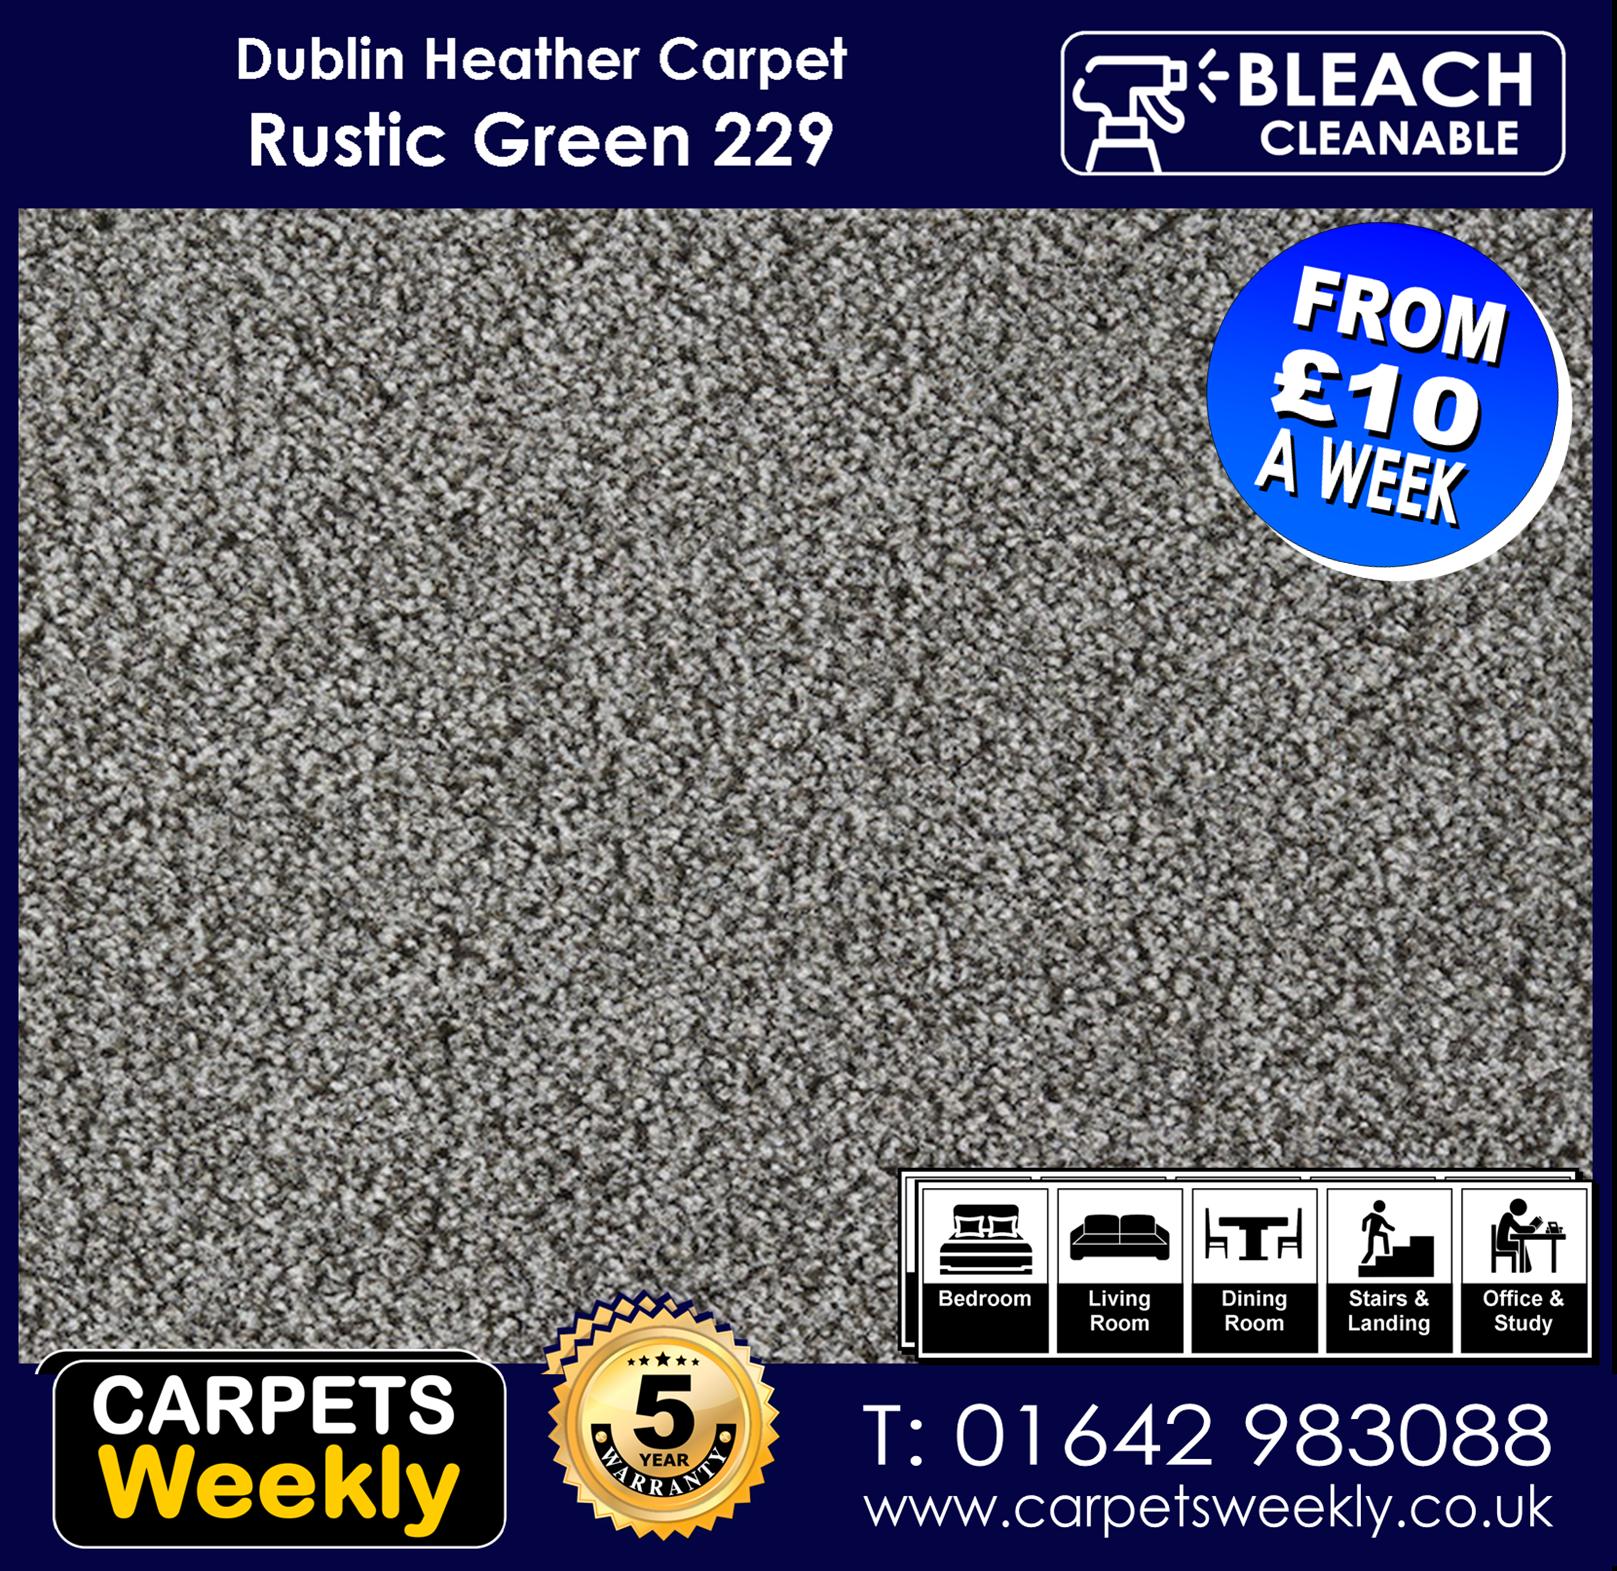 Carpets Weekly Dublin Heather Rustic Green - 229 mid range carpet